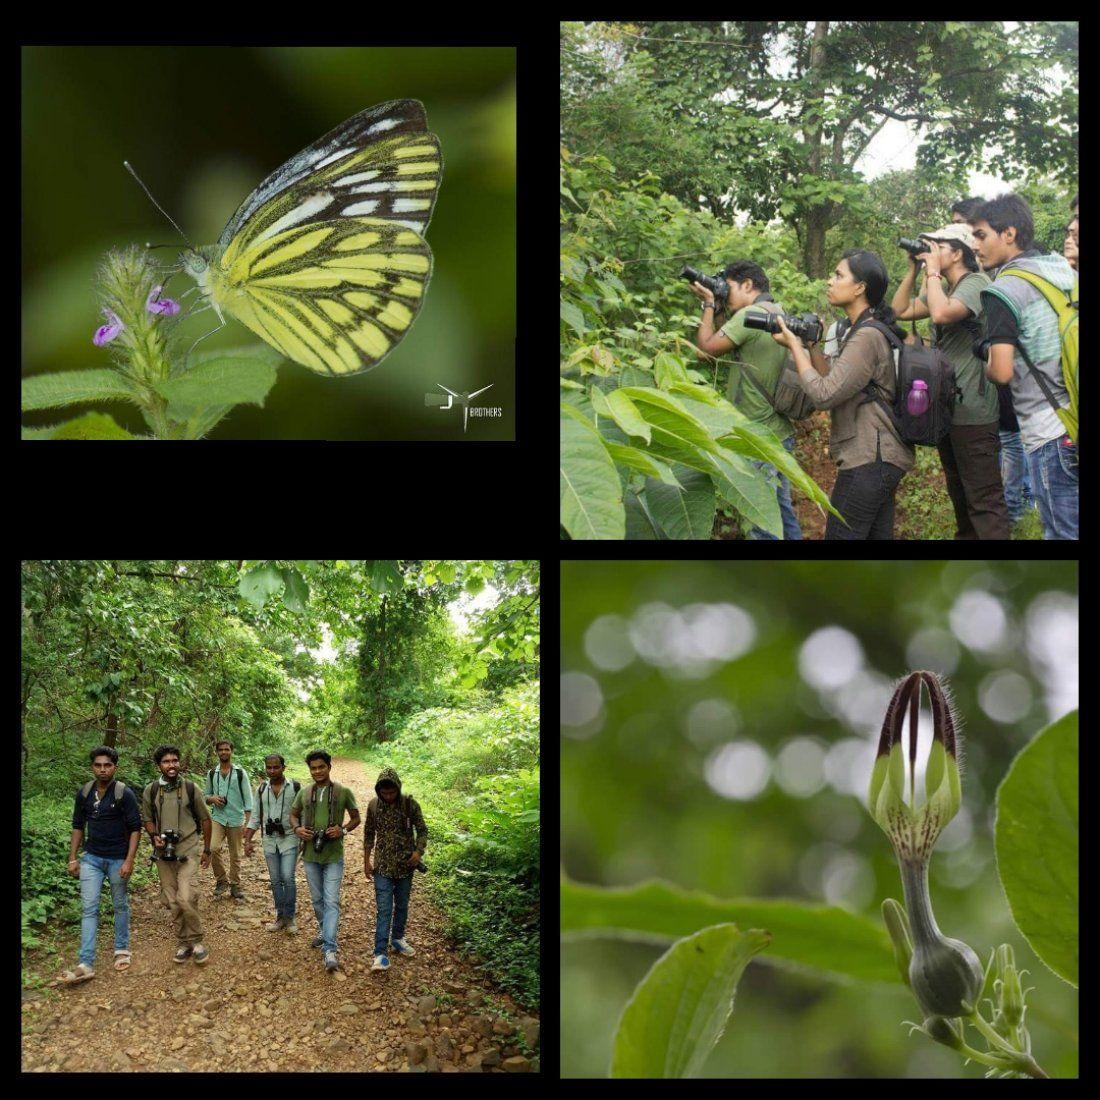 Nature trail and photowalk at Shilonda Sanjay Gandhi National Park